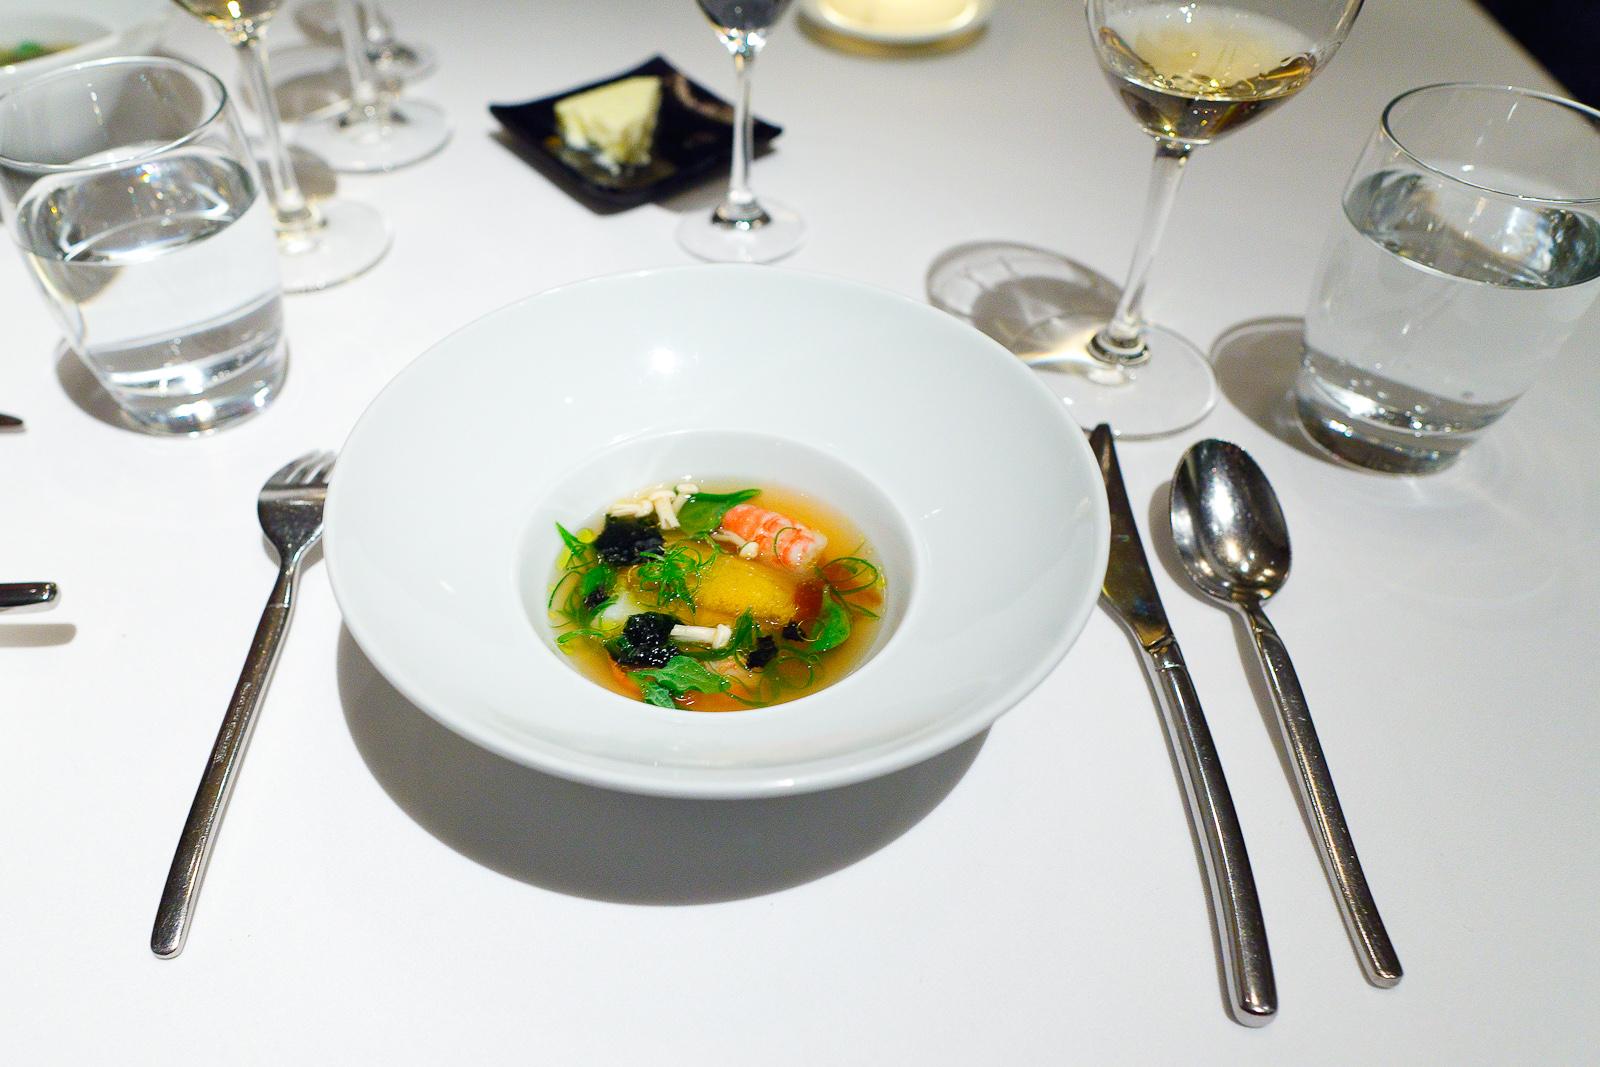 "9th Course: ""A Summer Tidal Pool"" - Monterey bay abalone, sea urchin, foie gras, local spot prawns, hinoki mushroom in a dashi broth"